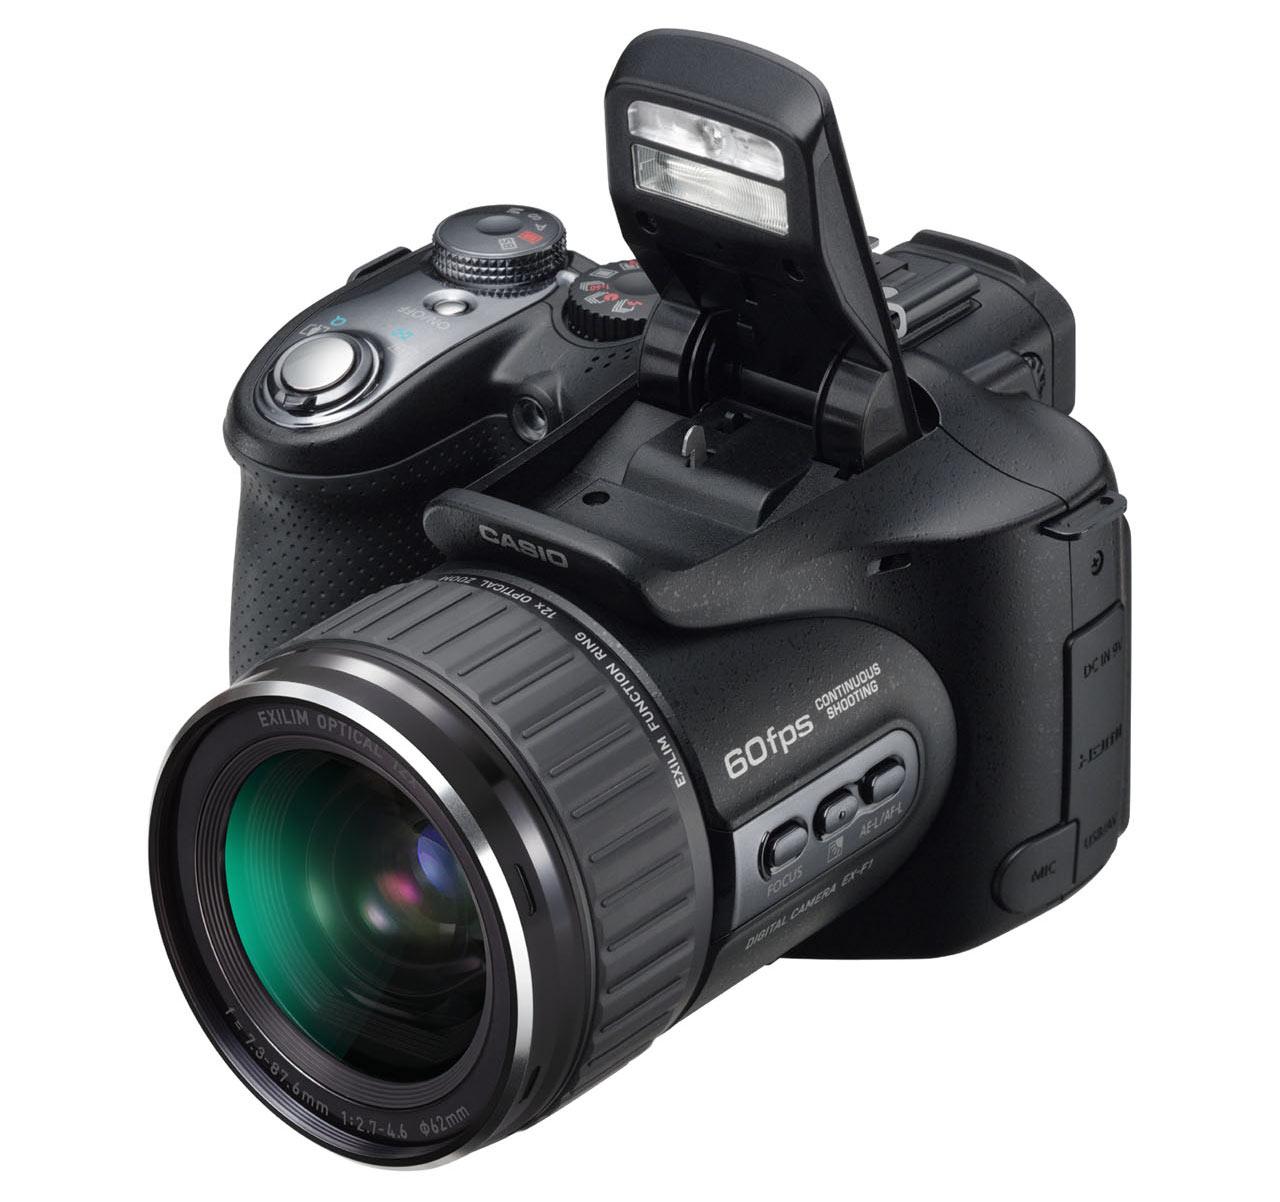 digital photography camera - photo #30